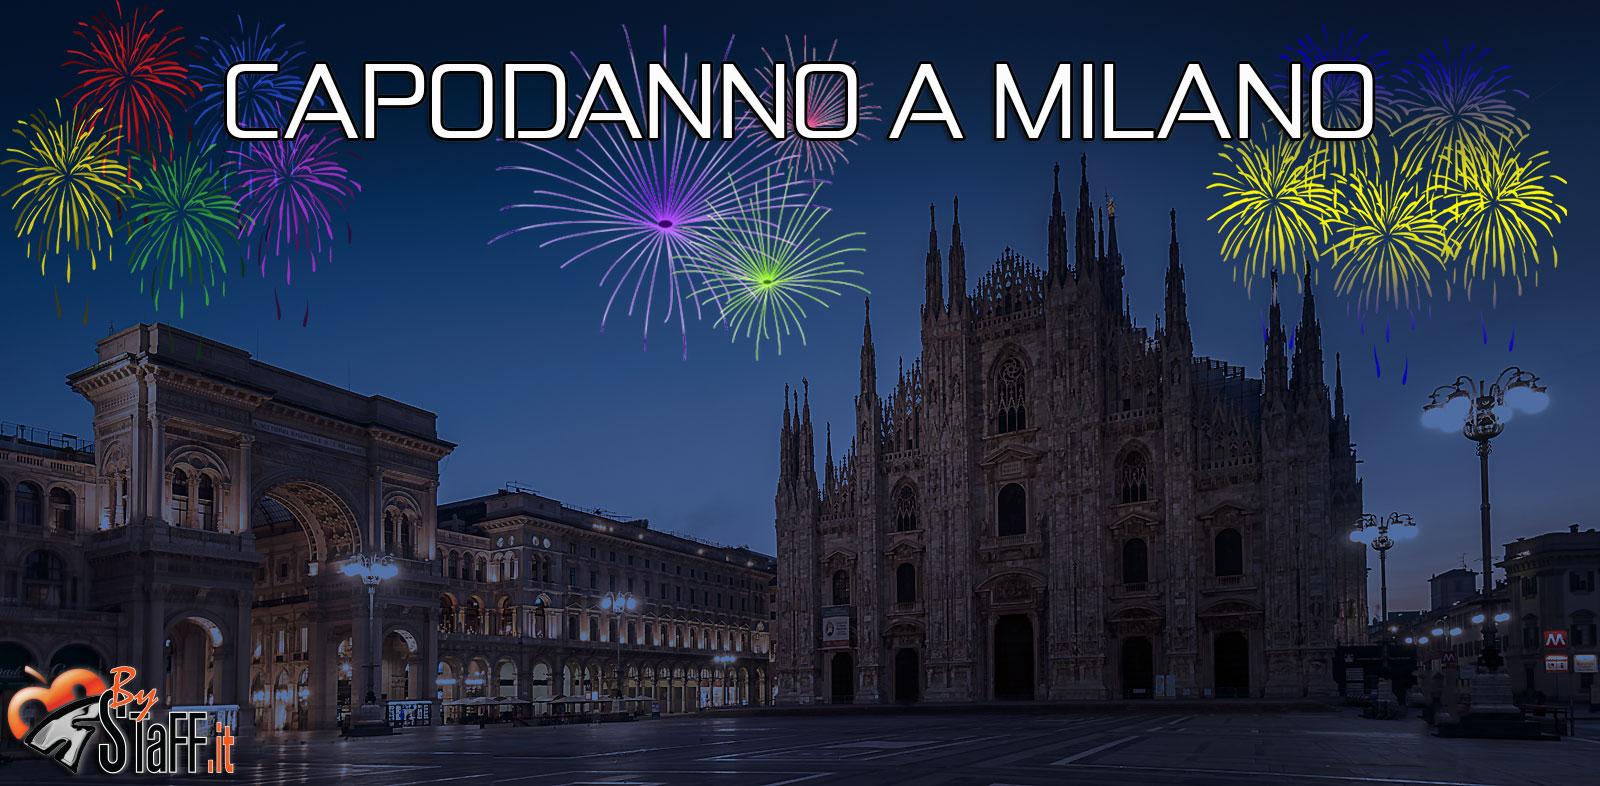 Capodanno a Milano - #bystaff.it